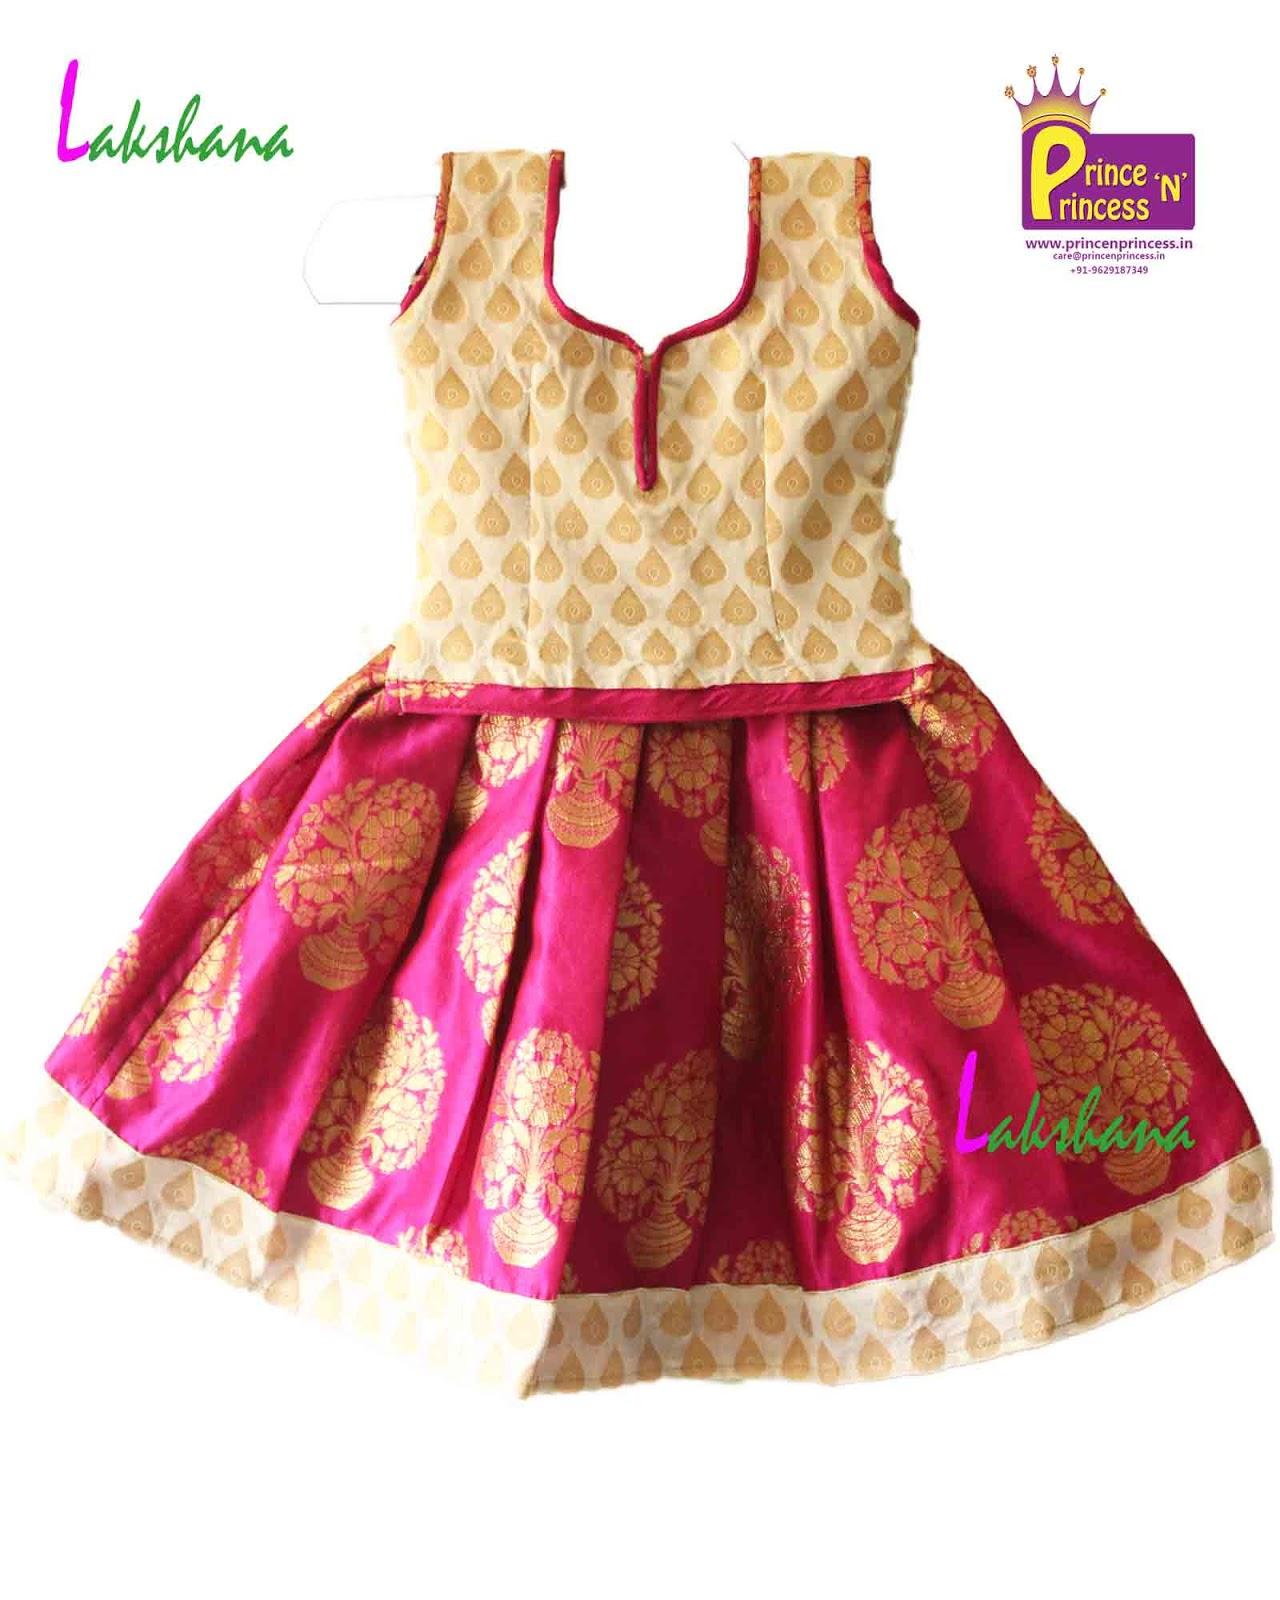 822d2e6338bb6 Prince N Princess  Grand Designer Pattu Pavdai Langa